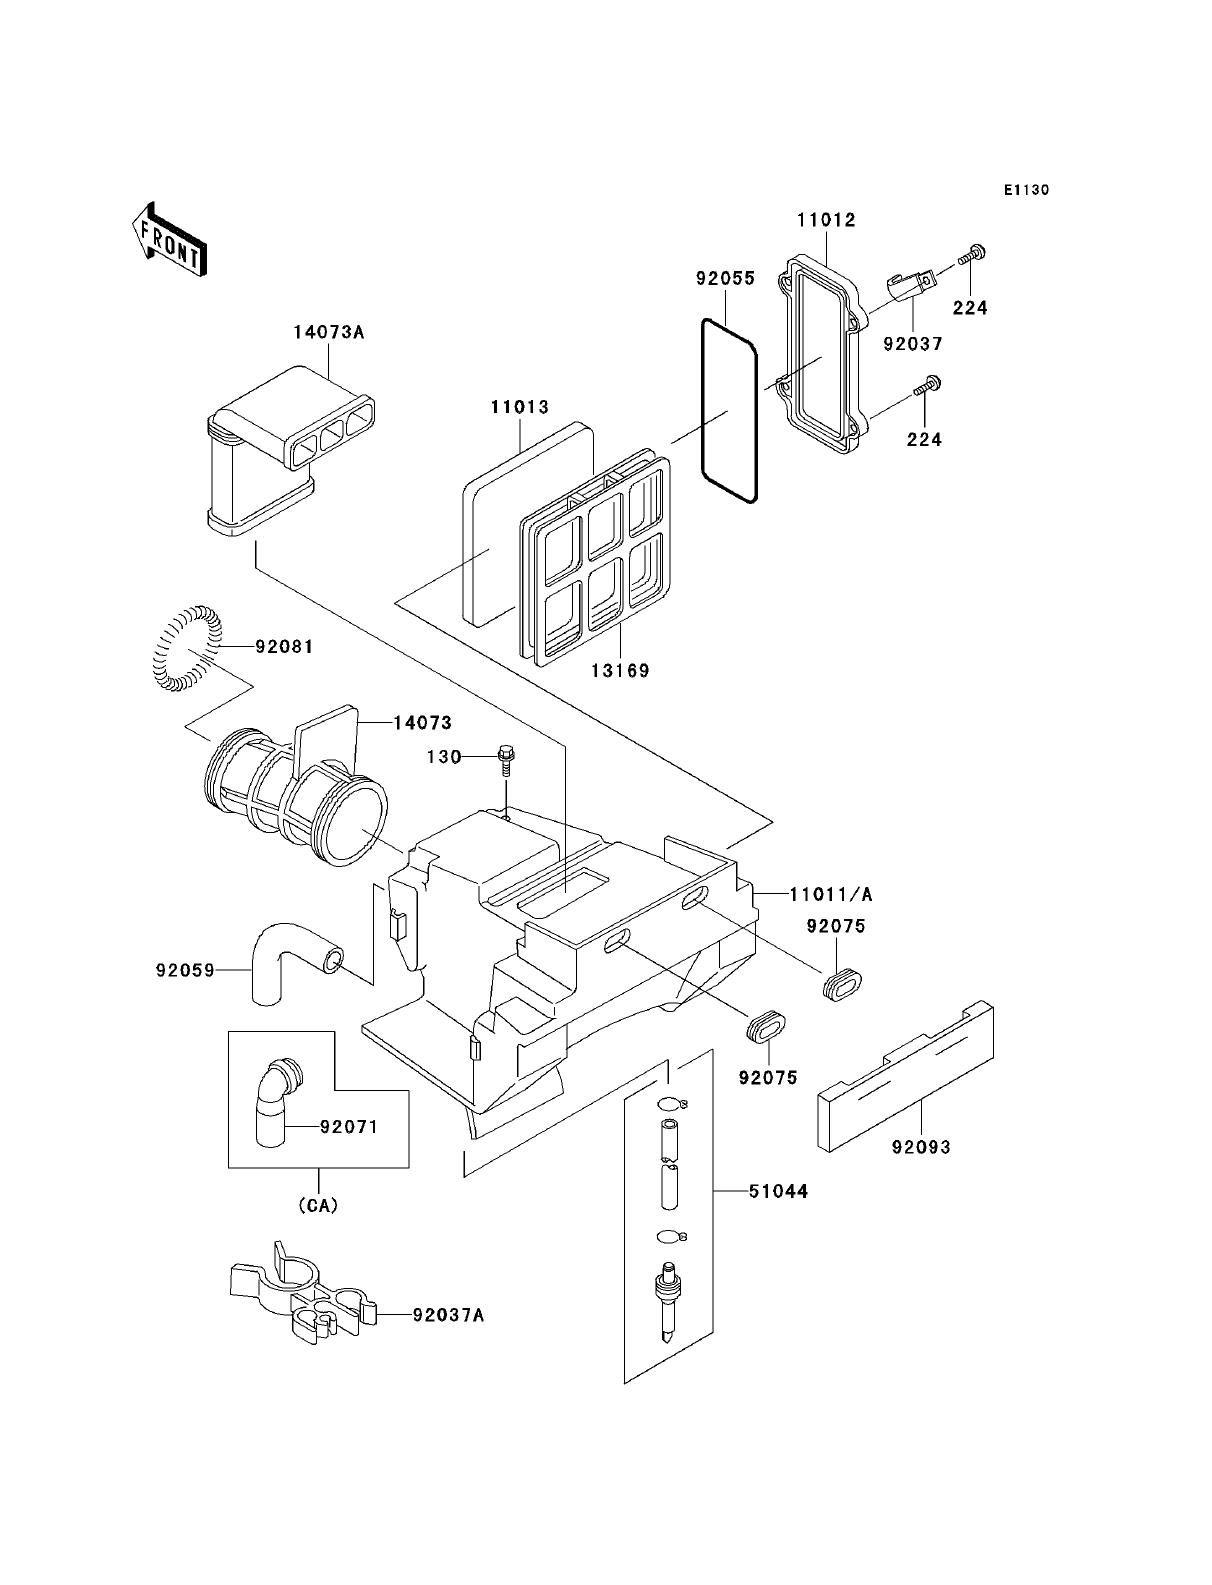 klr250_parts_diagram_airbox?resize=665%2C870 2005 klr 650 wiring diagram the best wiring diagram 2017 2005 klr 650 wiring diagram at bayanpartner.co